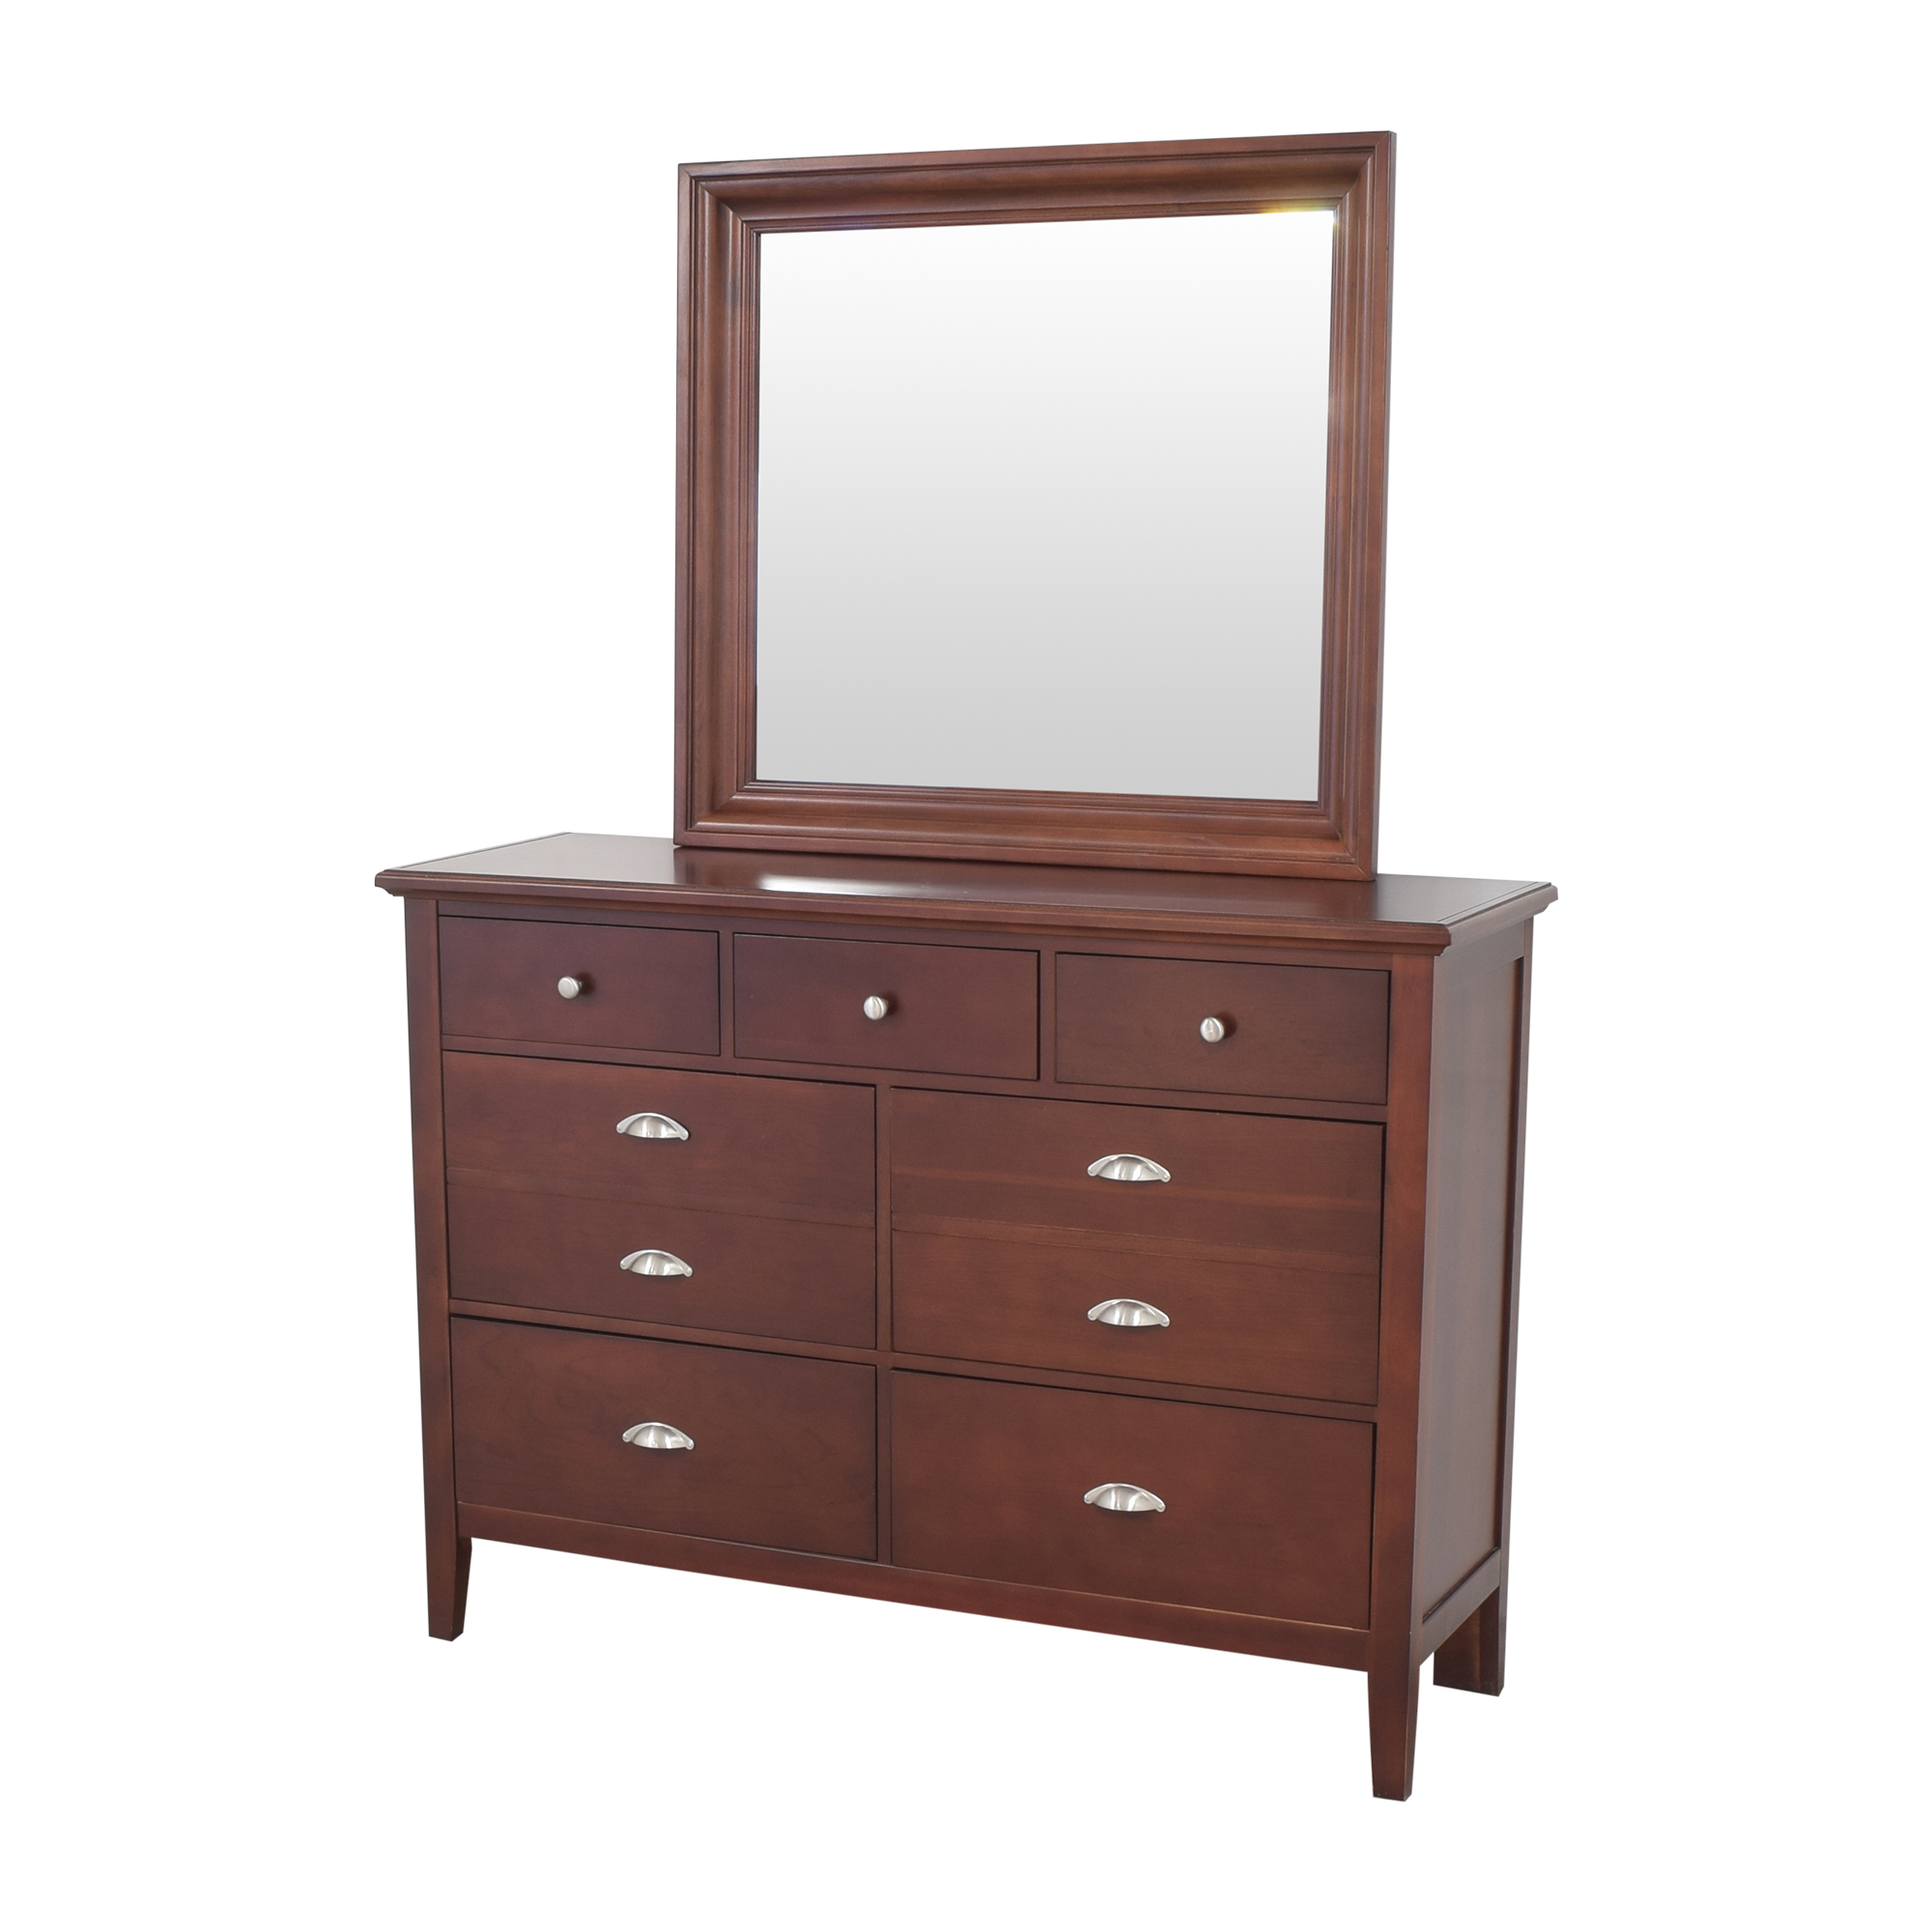 Vaughan-Bassett Twilight Triple Dresser with Mirror / Storage